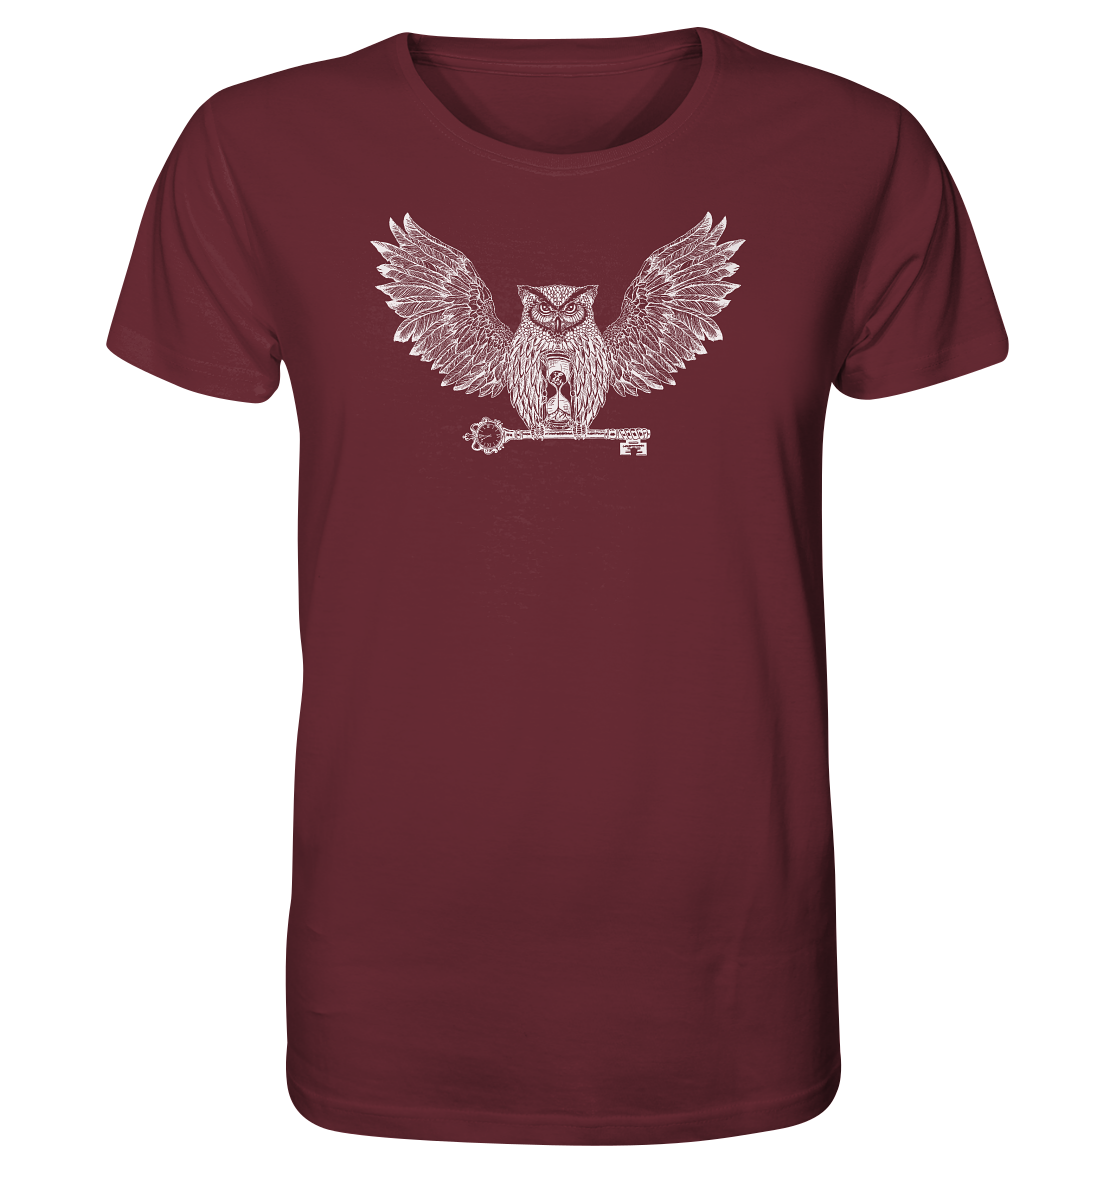 front-organic-shirt-672b34-1116x-4.png